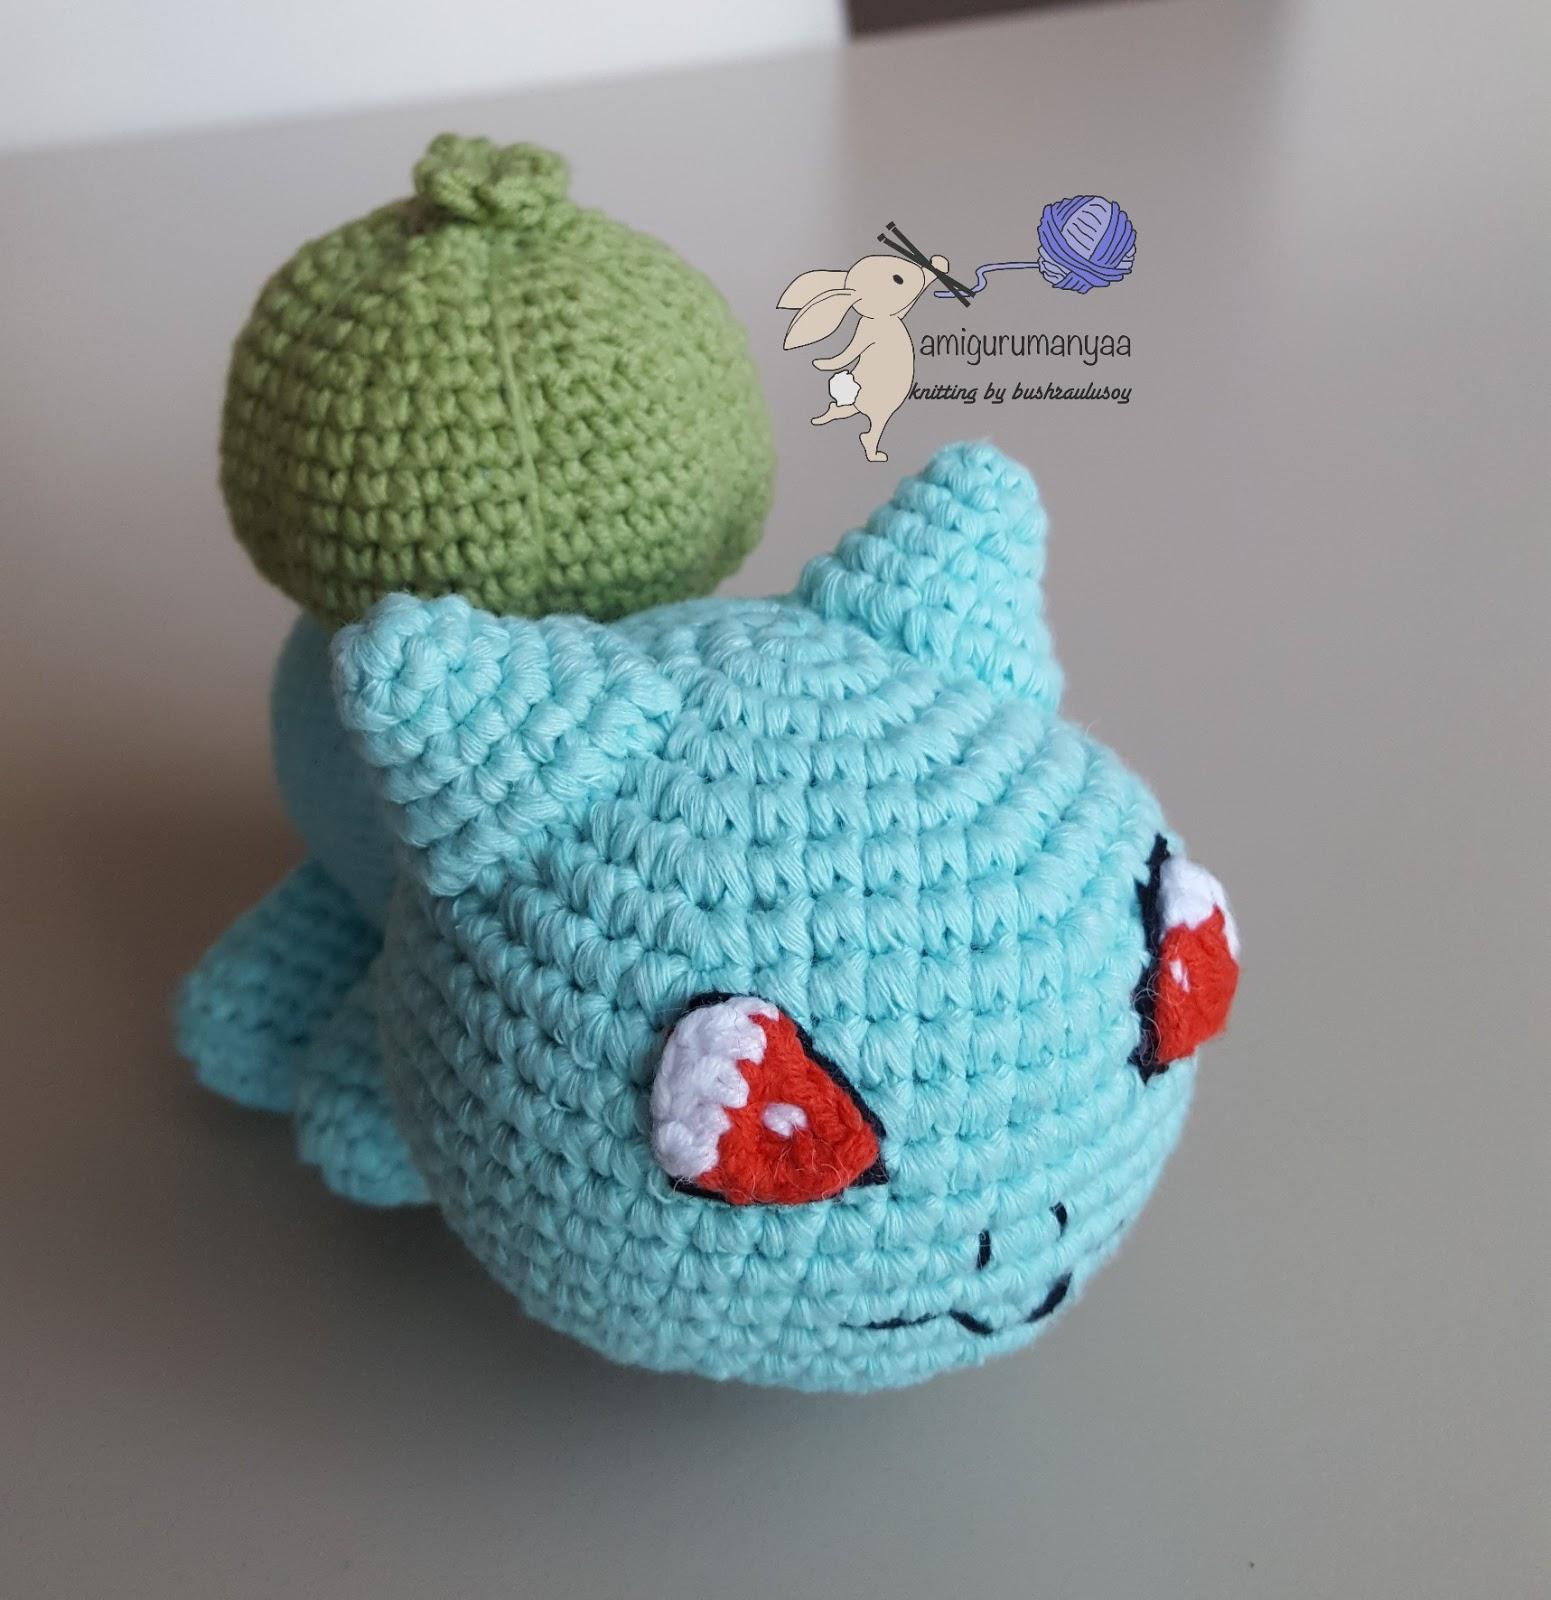 Pikachu (Pokemon) by sabrinapina on DeviantArt (Görüntüler ile ...   1600x1551